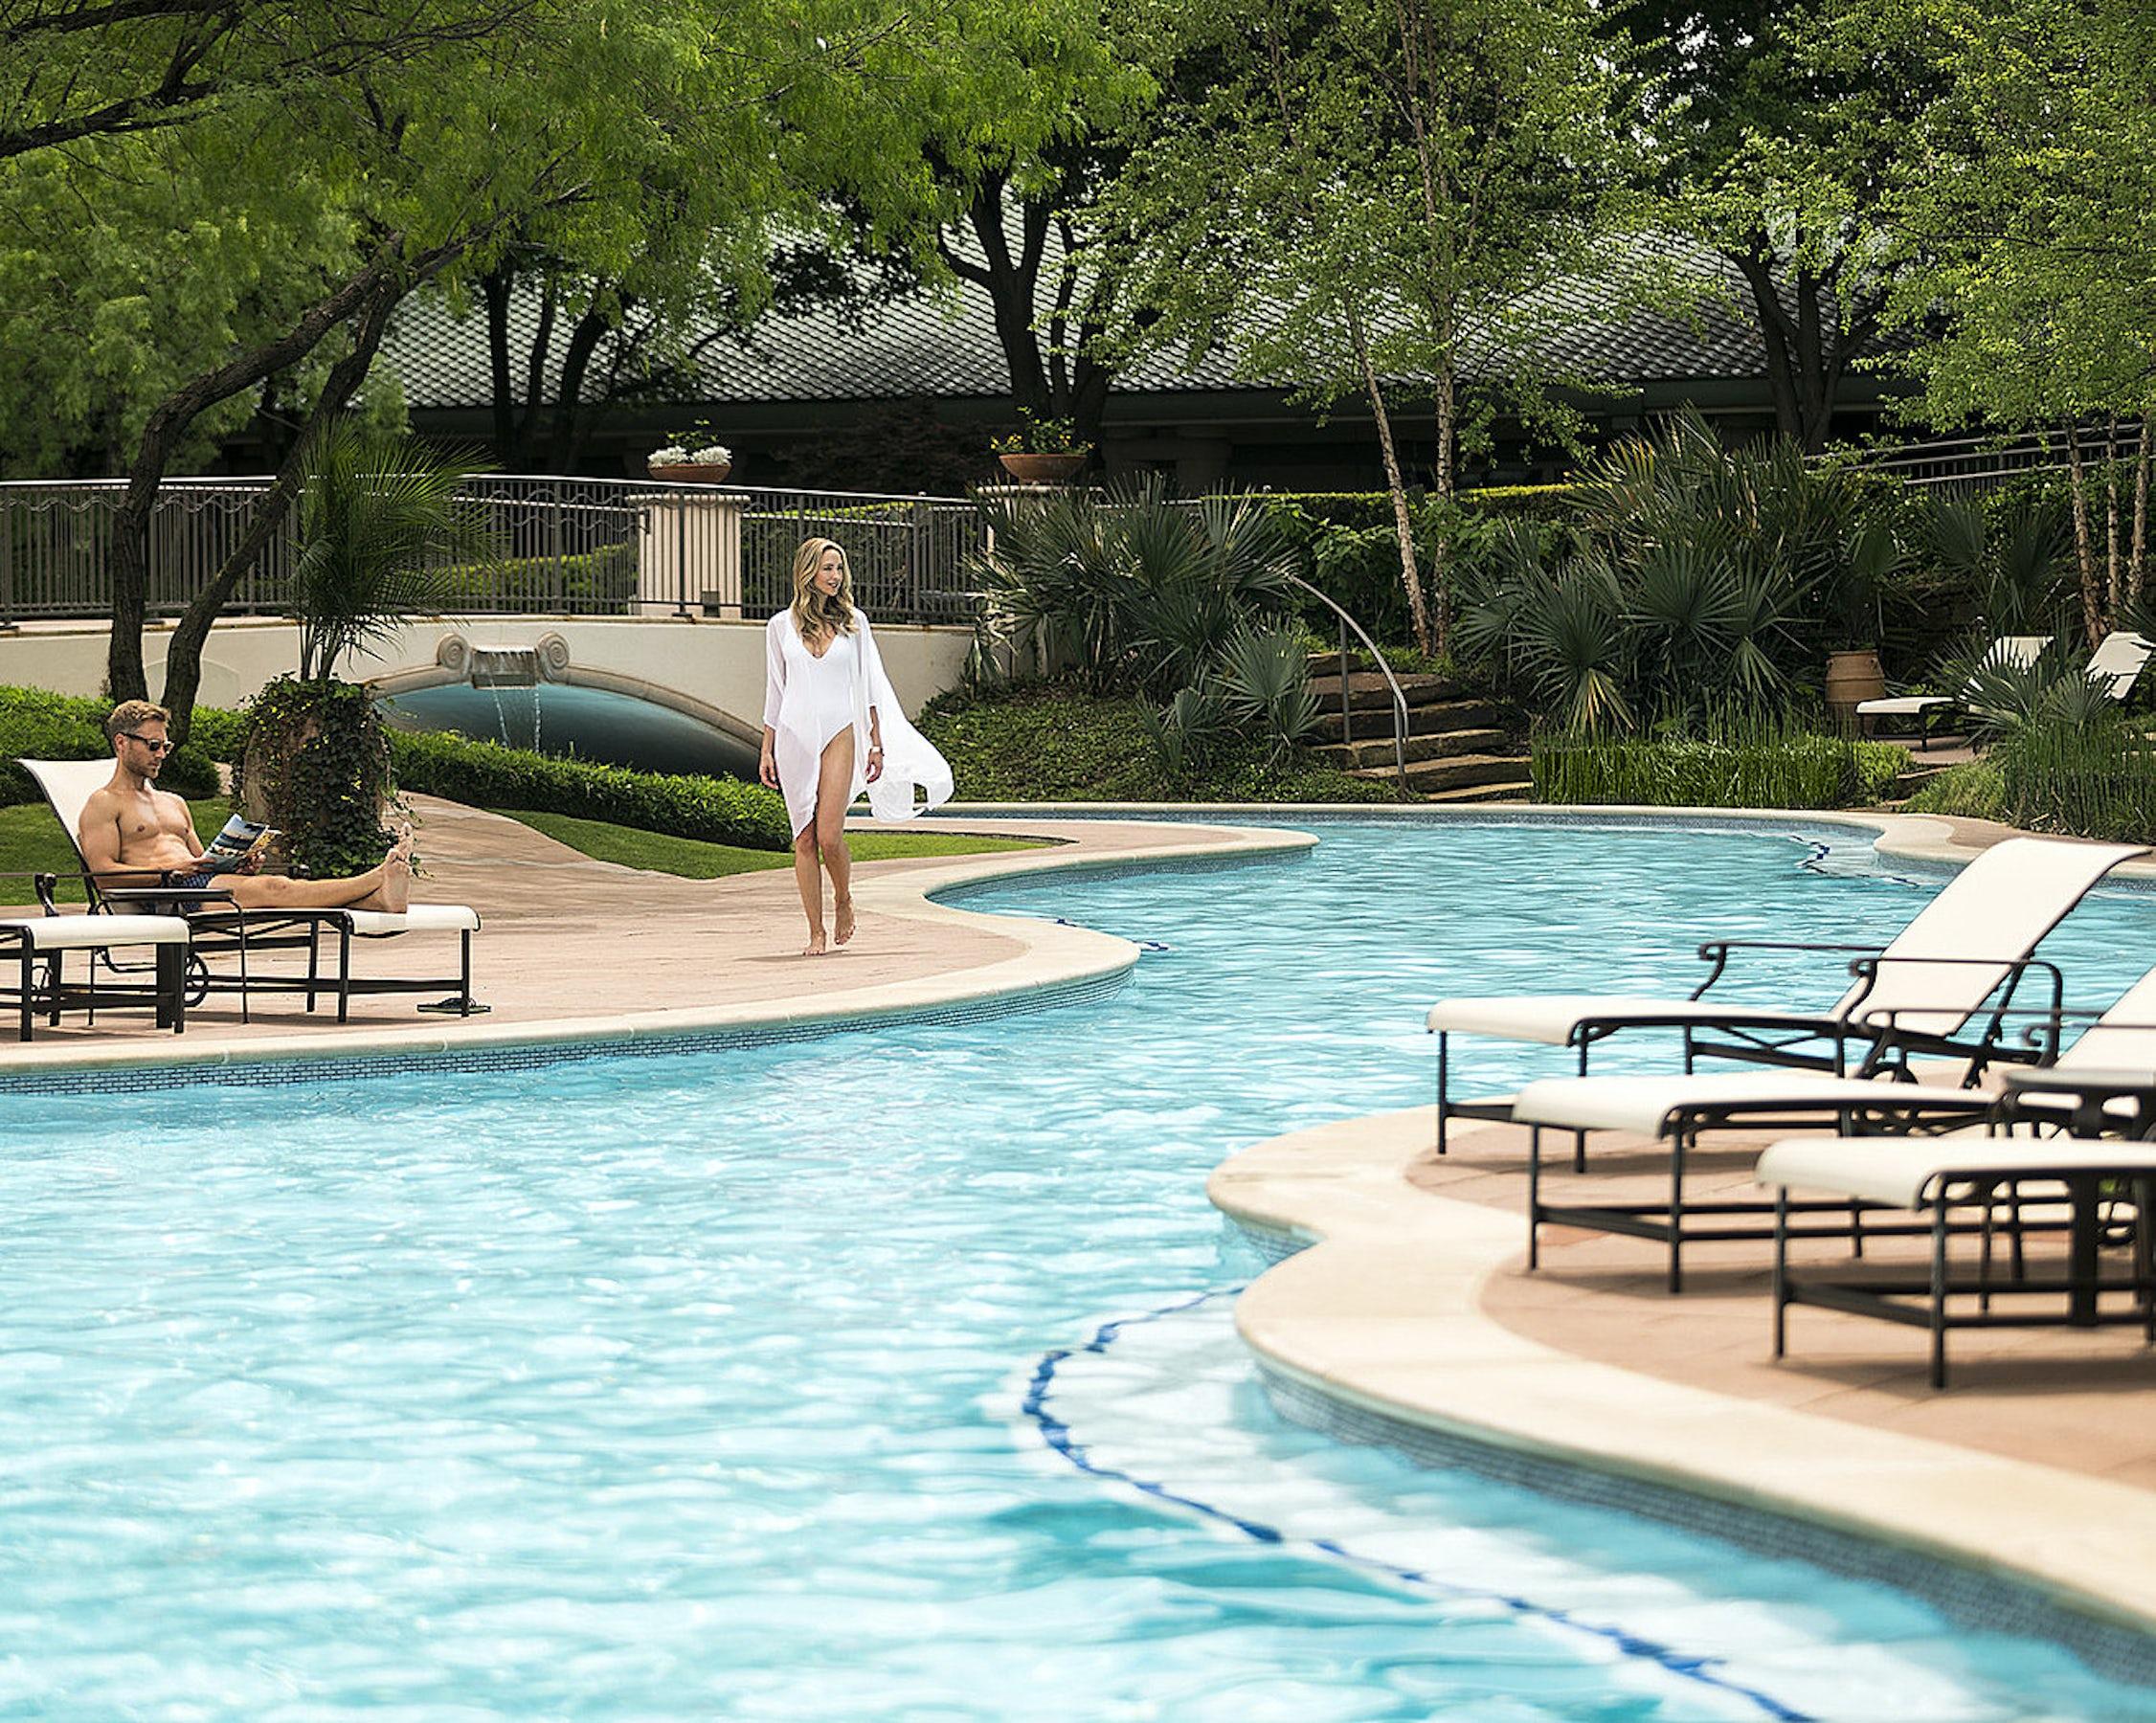 Four Seasons Resort and Club Las Colinas in Beyond Dallas